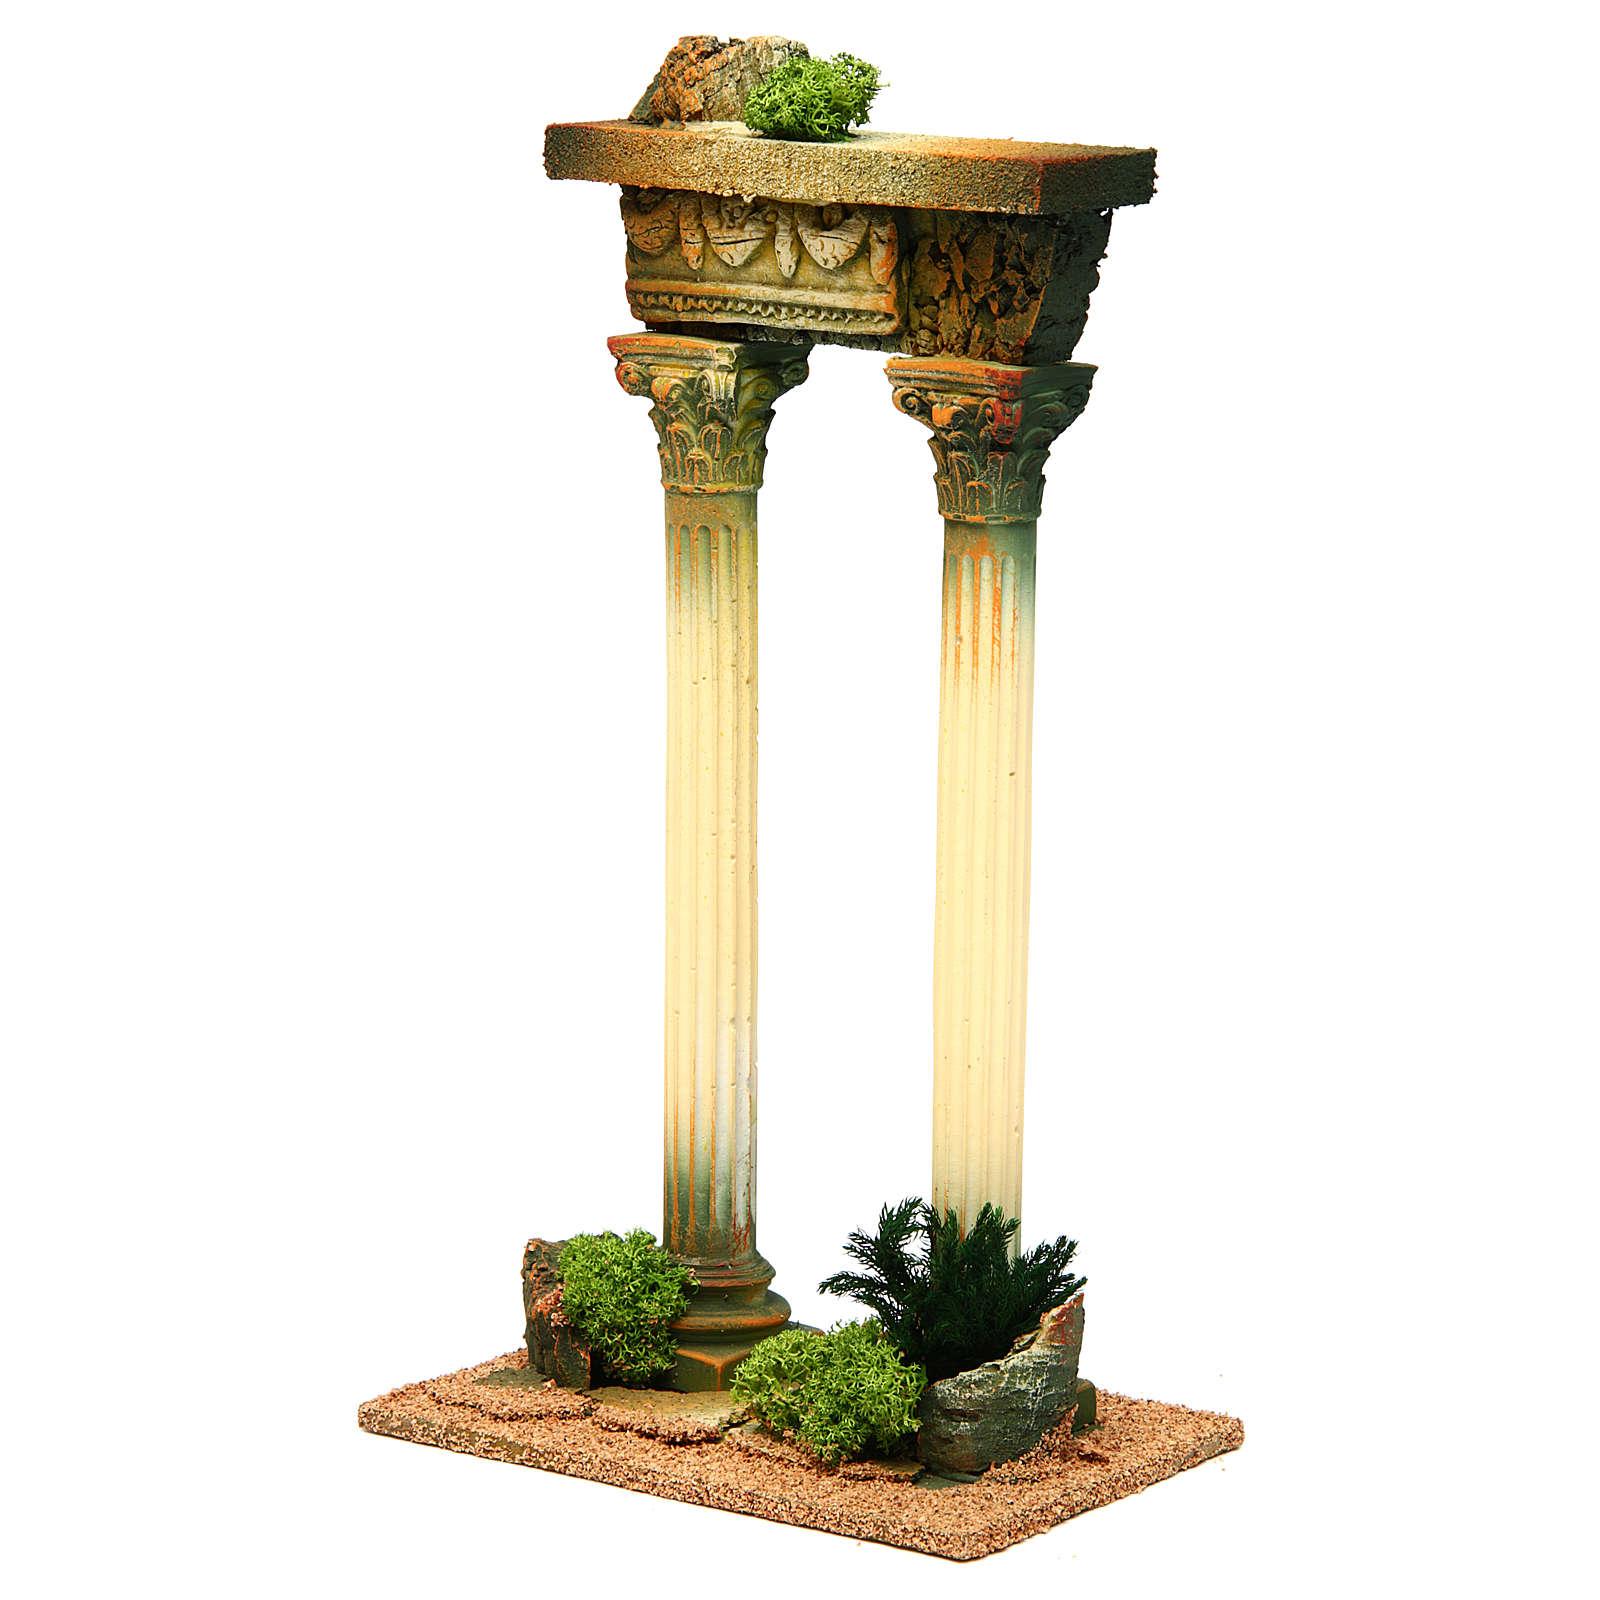 Columnas romana con viga: ambientación belén 4